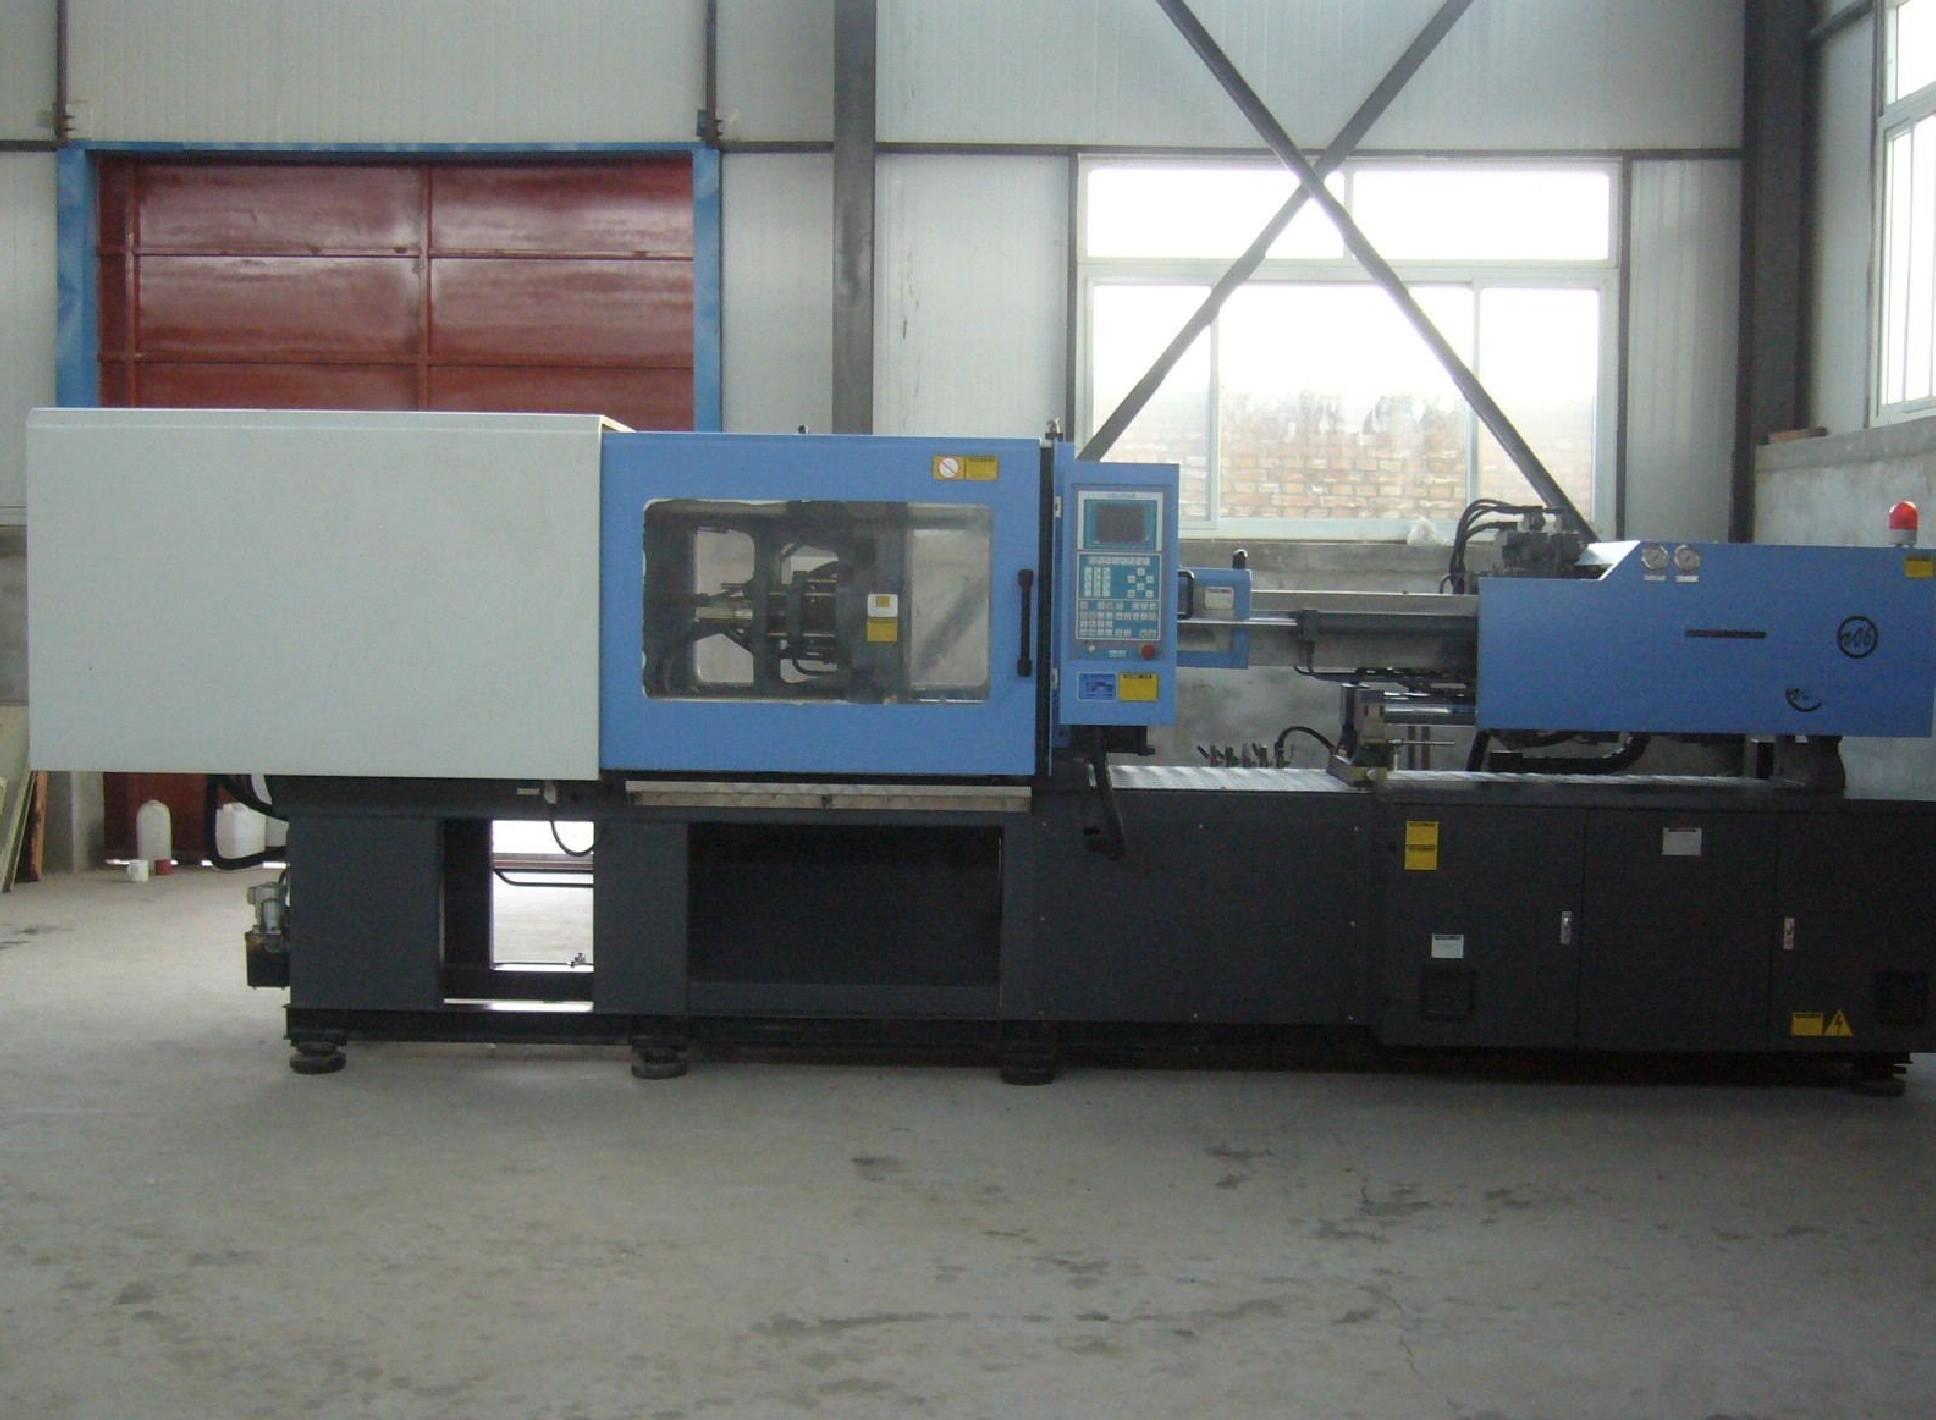 Industrial 1000 Ton Plastic Injection Molding Machine For PET Bottle Preform Making